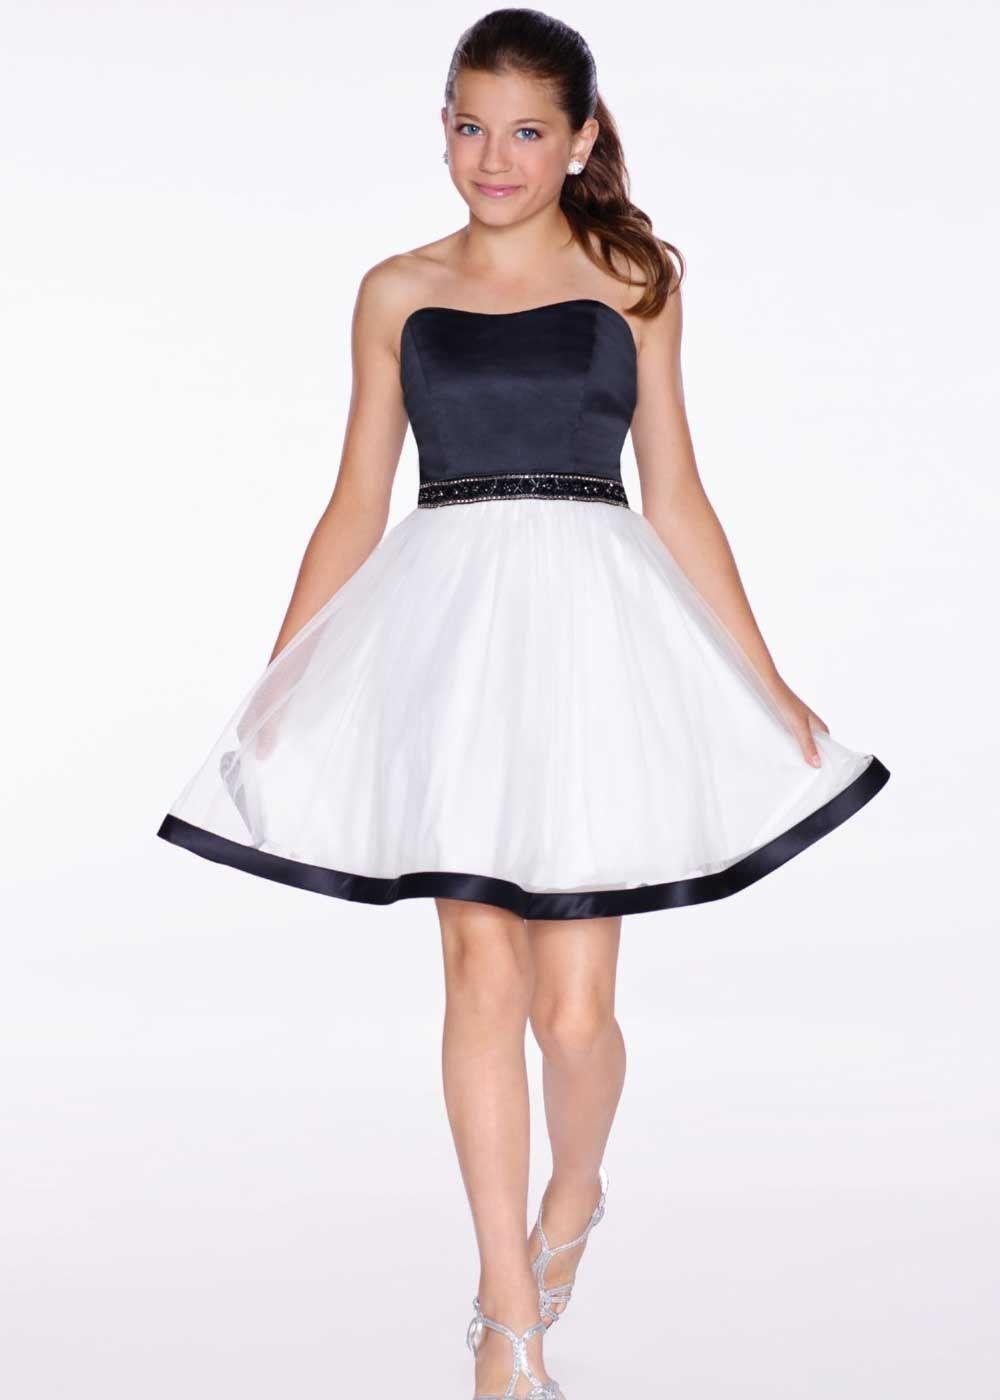 Lexie by Mon Cheri TW11664 Sleeveless Girls Party Dress   bat ...